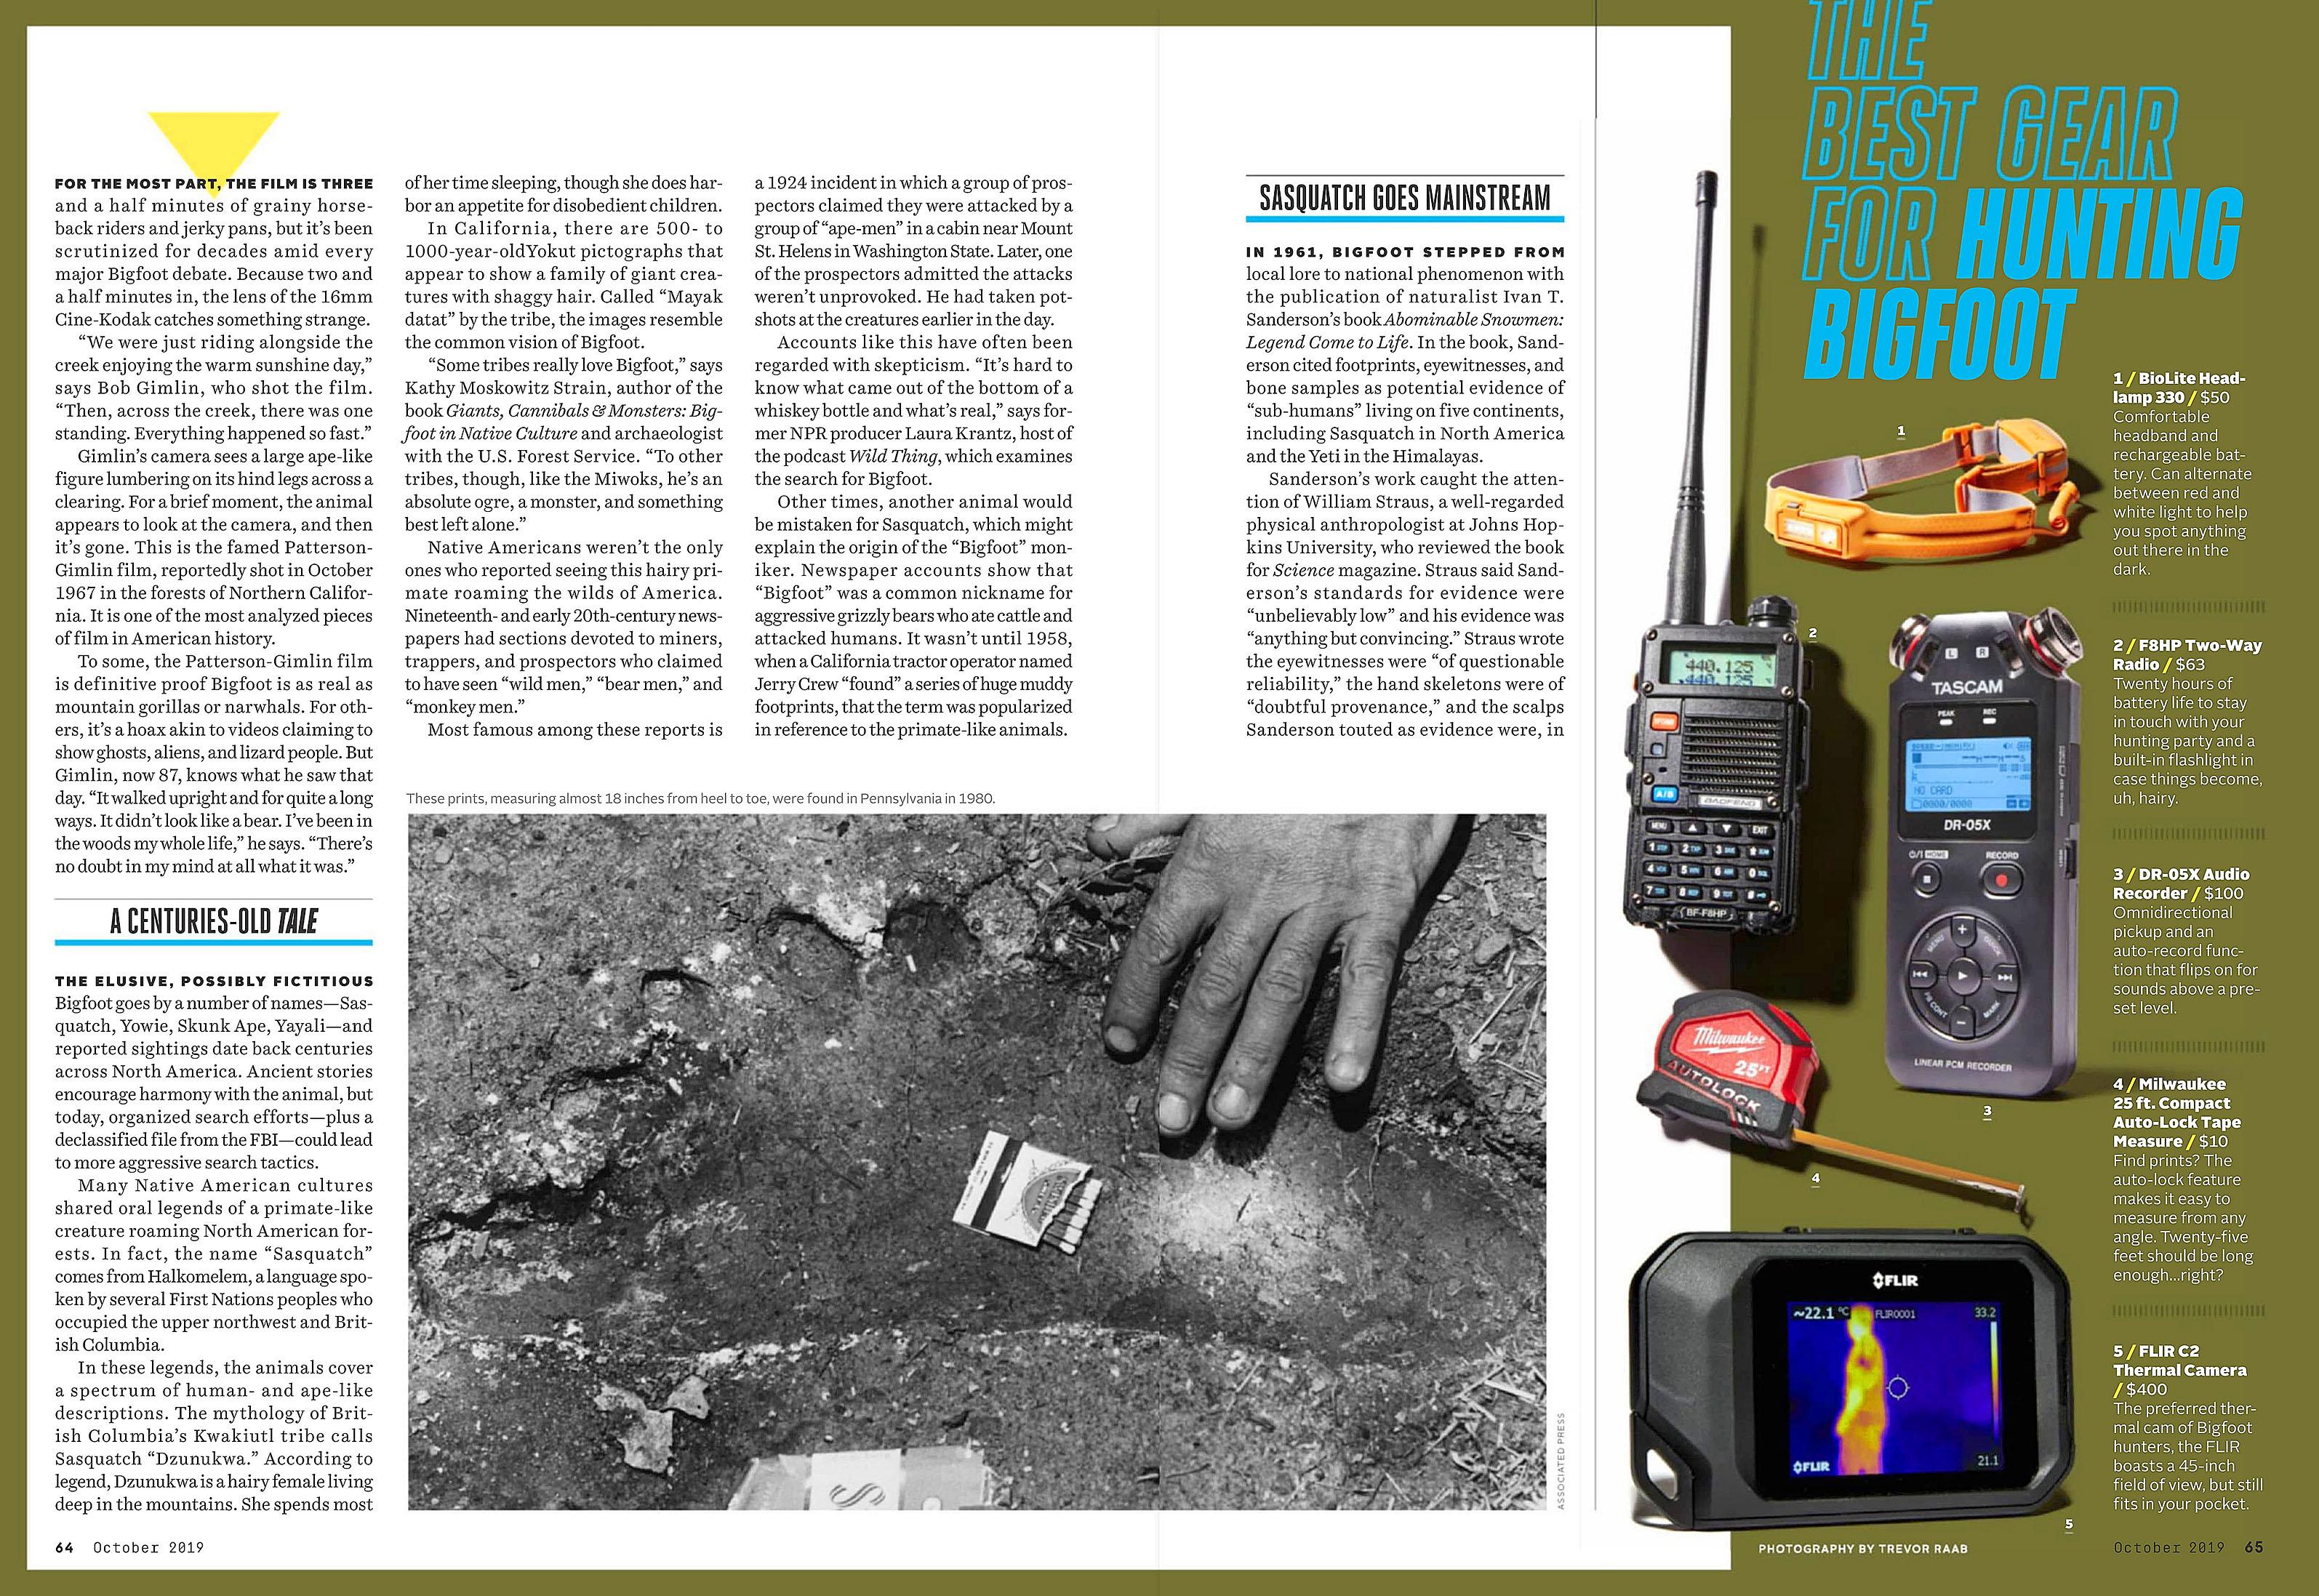 Popular Mechanics 2019-10 Yeti2.jpg